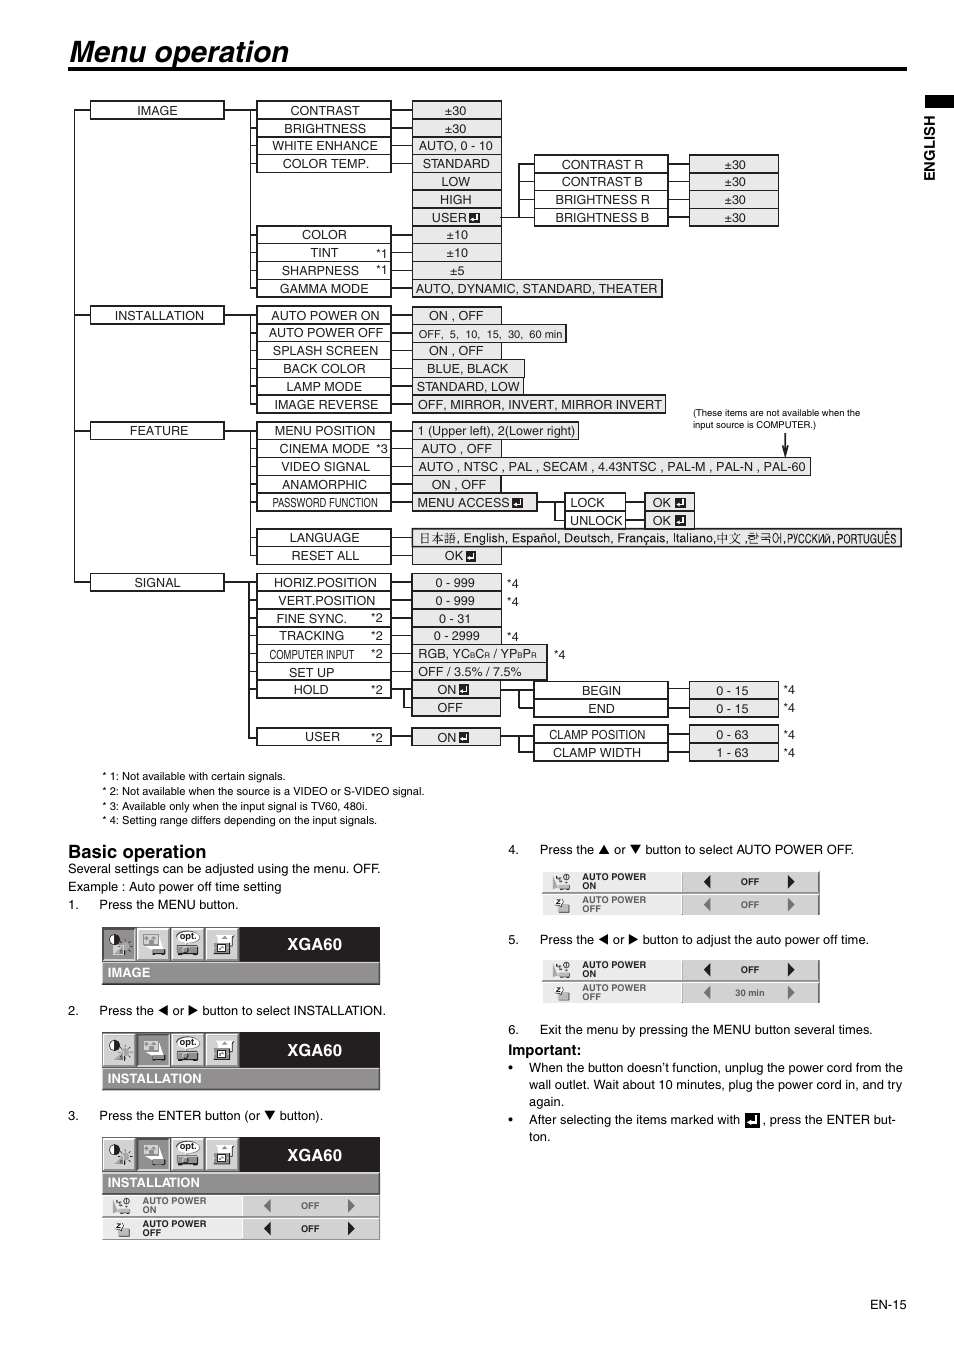 Menu operation, Basic operation, Xga60 | MITSUBISHI ELECTRIC XD430U User  Manual | Page 15 / 30